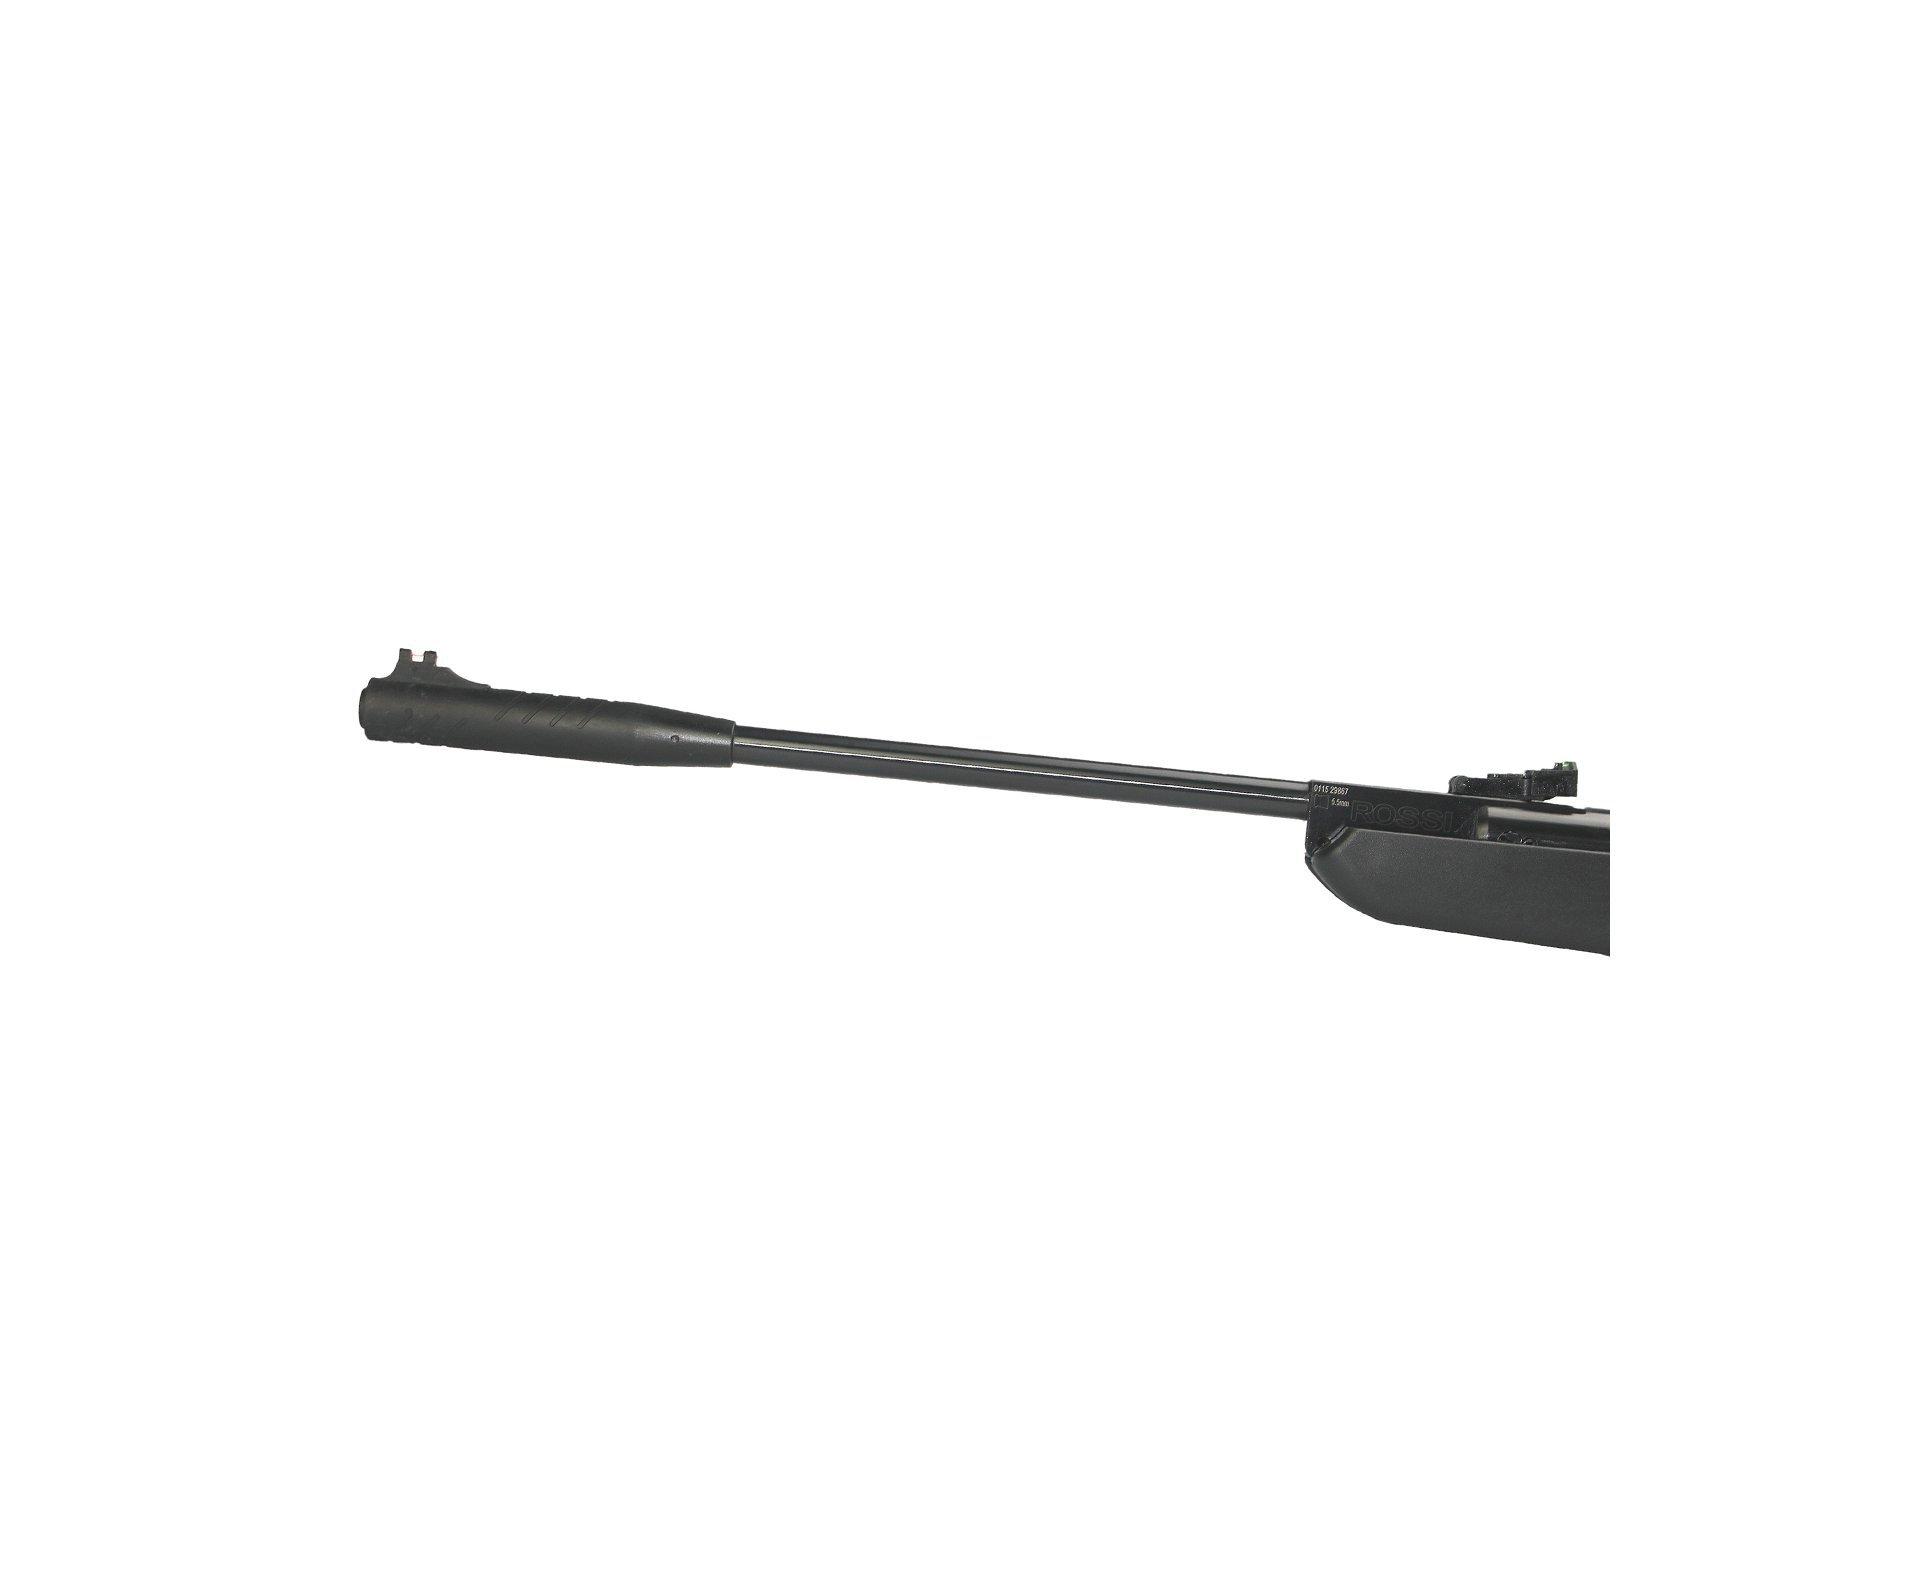 Carabina De Pressão Hatsan Ht 125 - Calibre 5,5 Mm - Sistema Sas